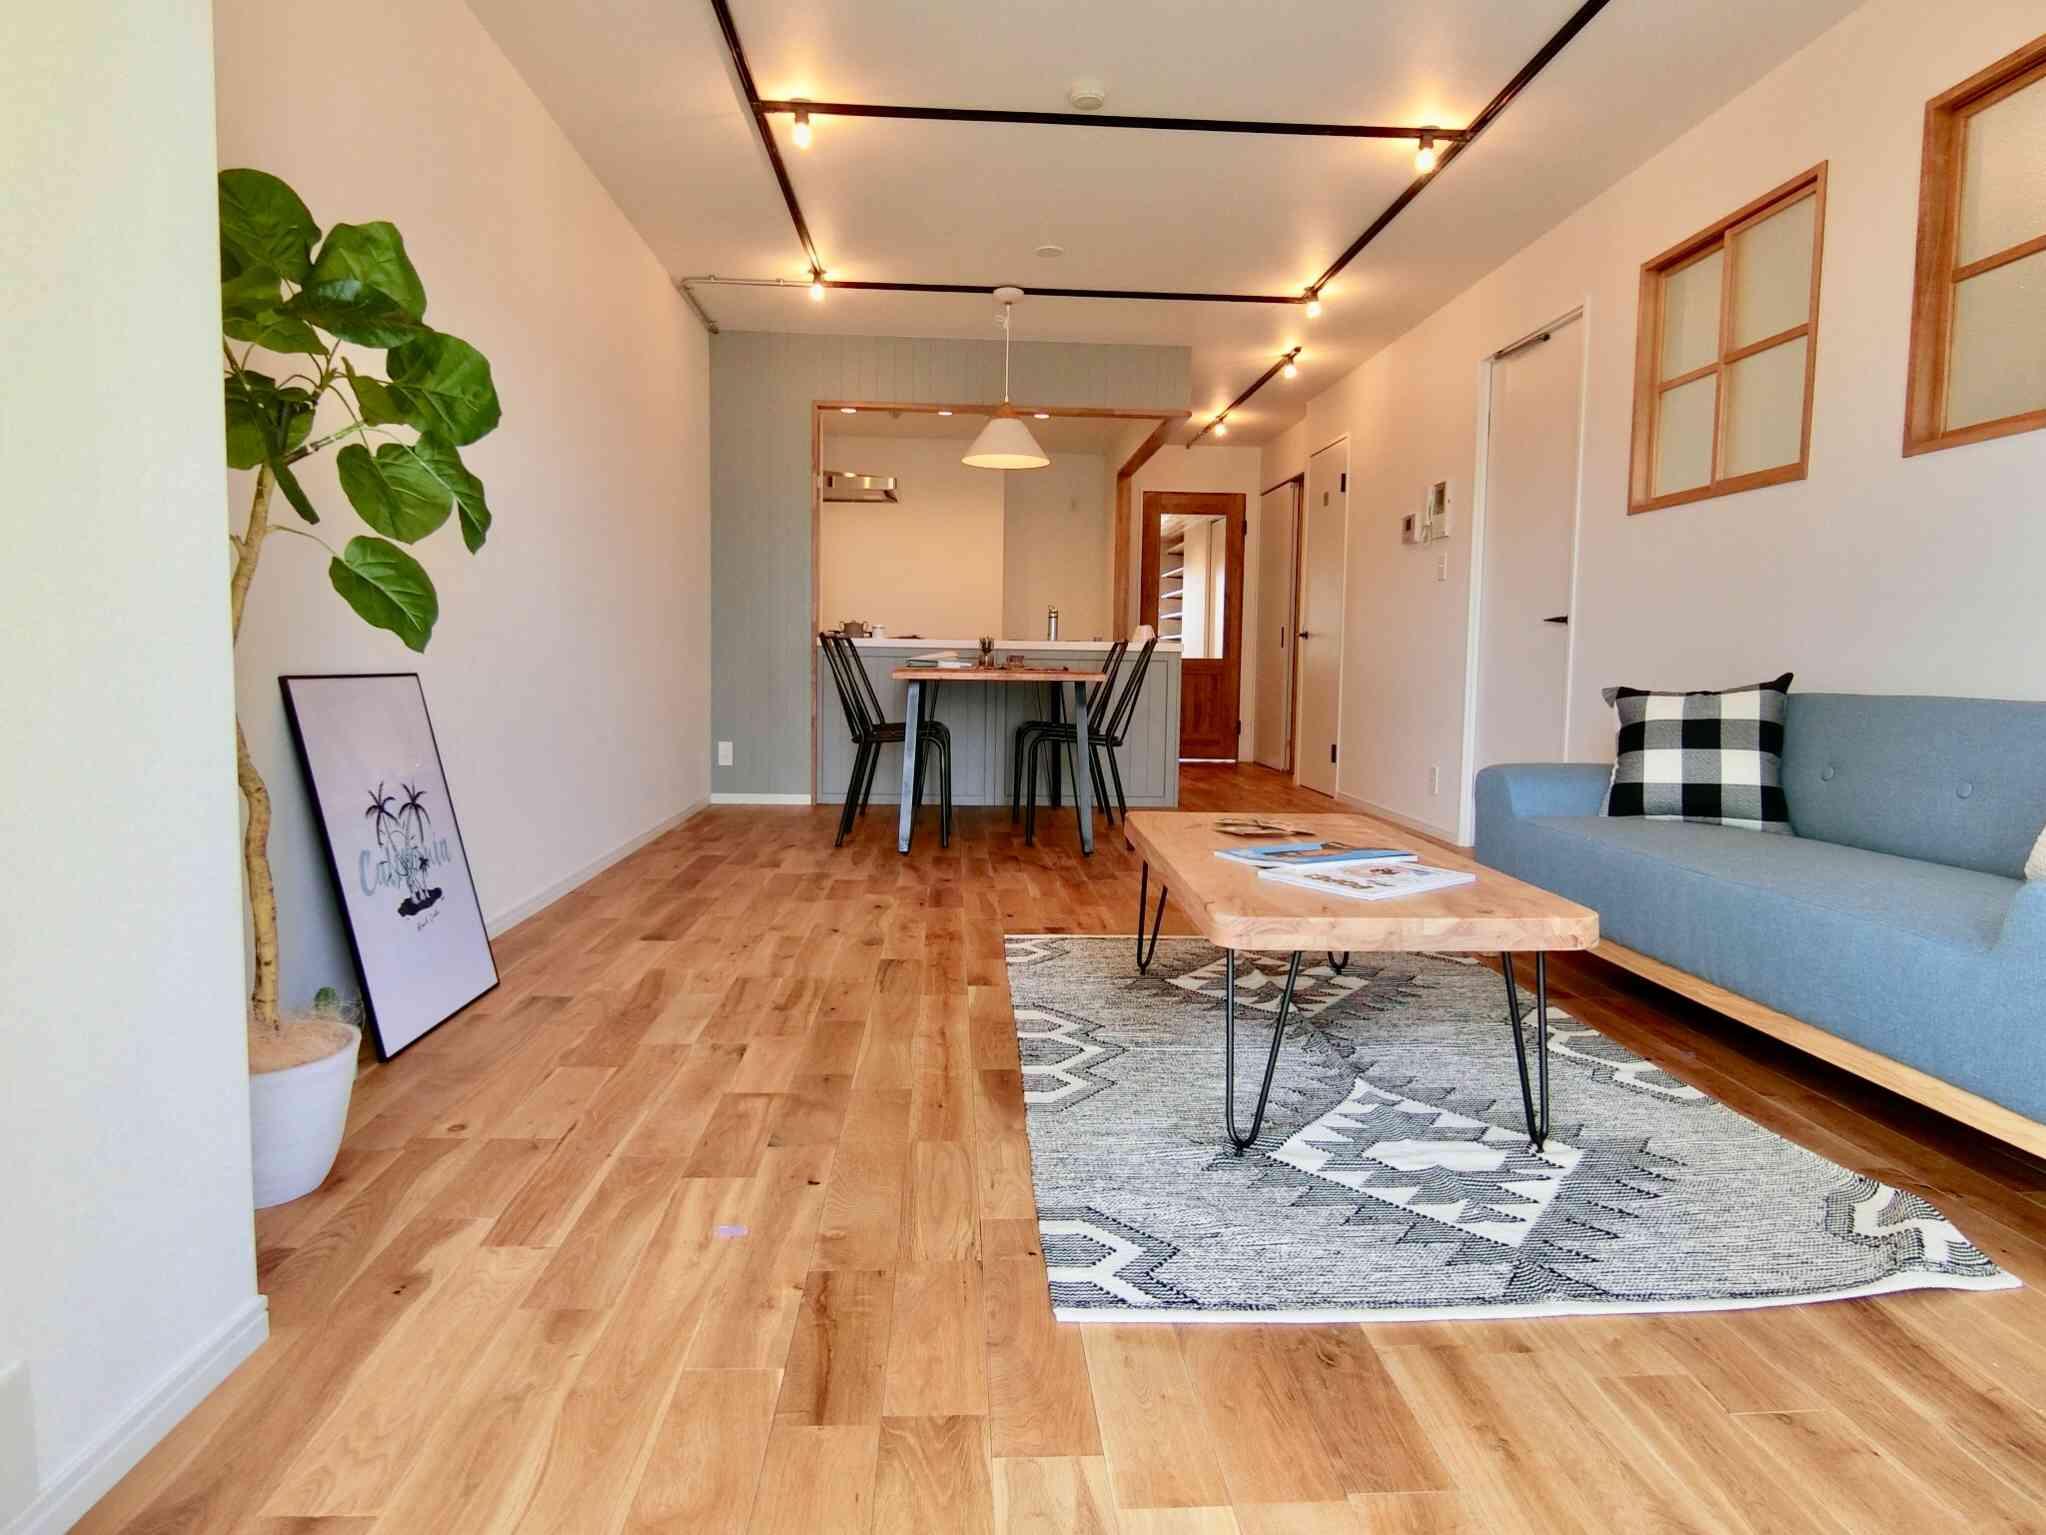 OPEN ROOM | 人気の清澄白河エリアのおしゃれ部屋